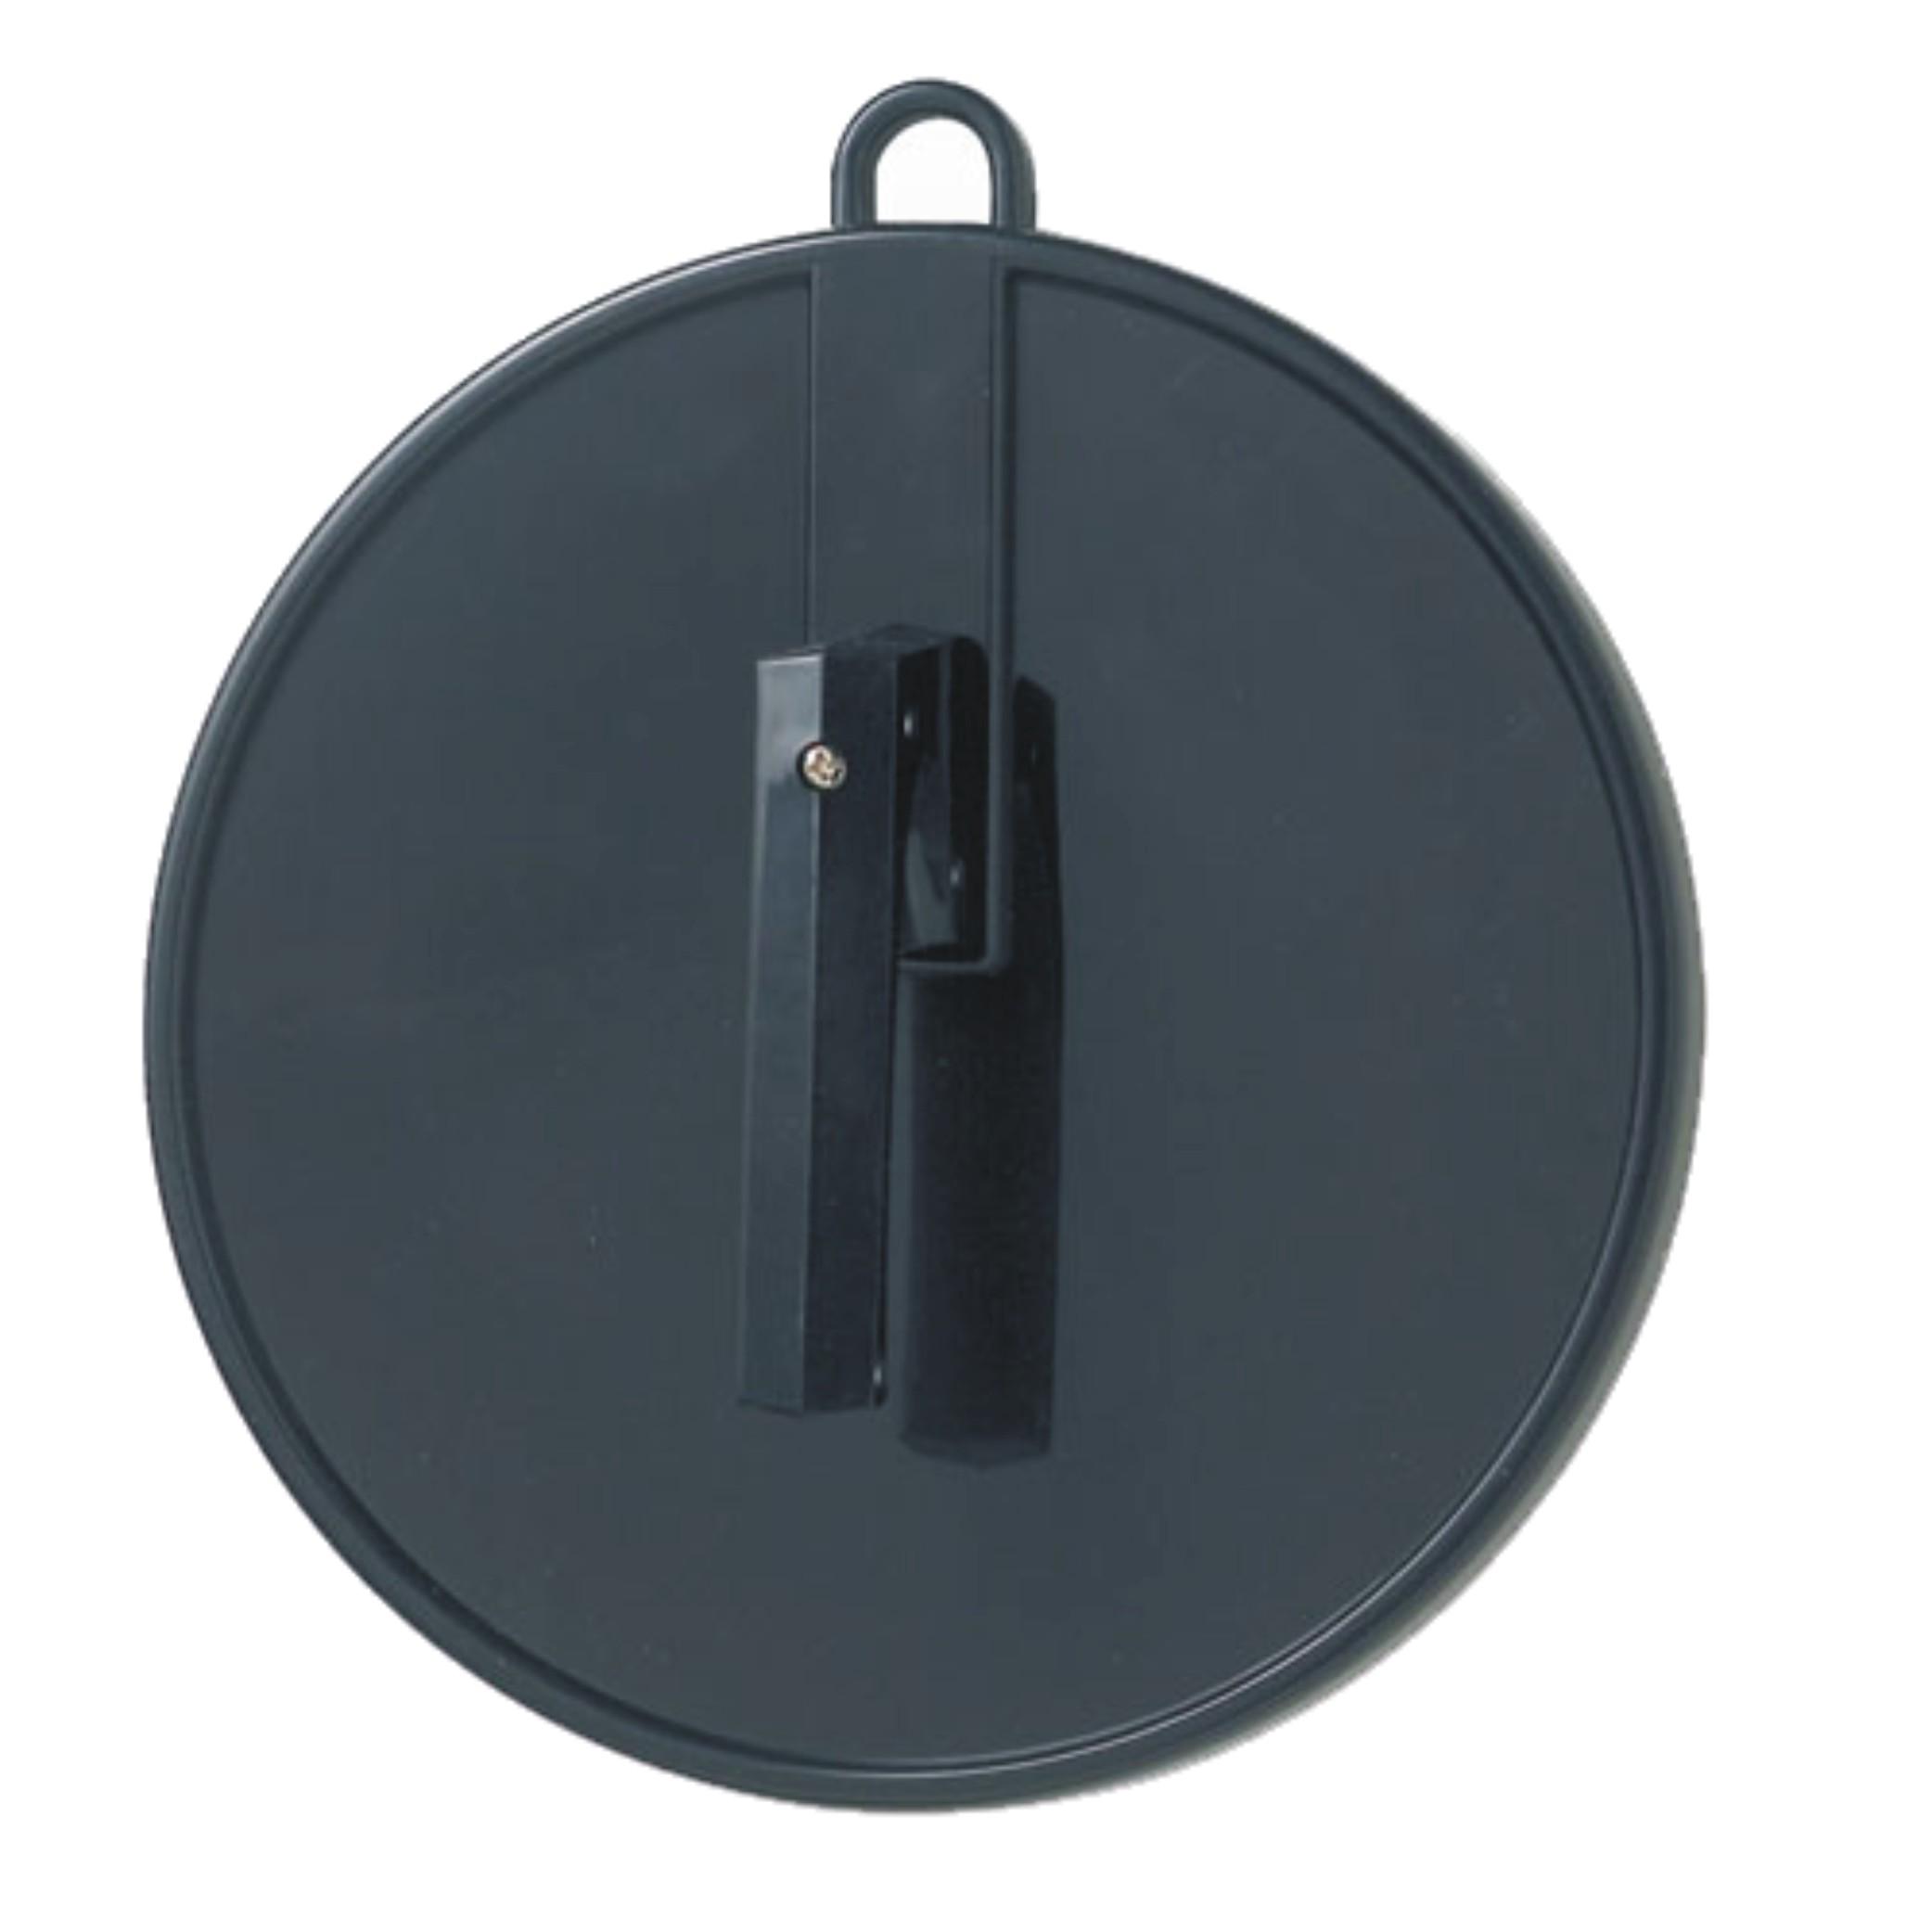 Kabinett-Handspiegel schwarz